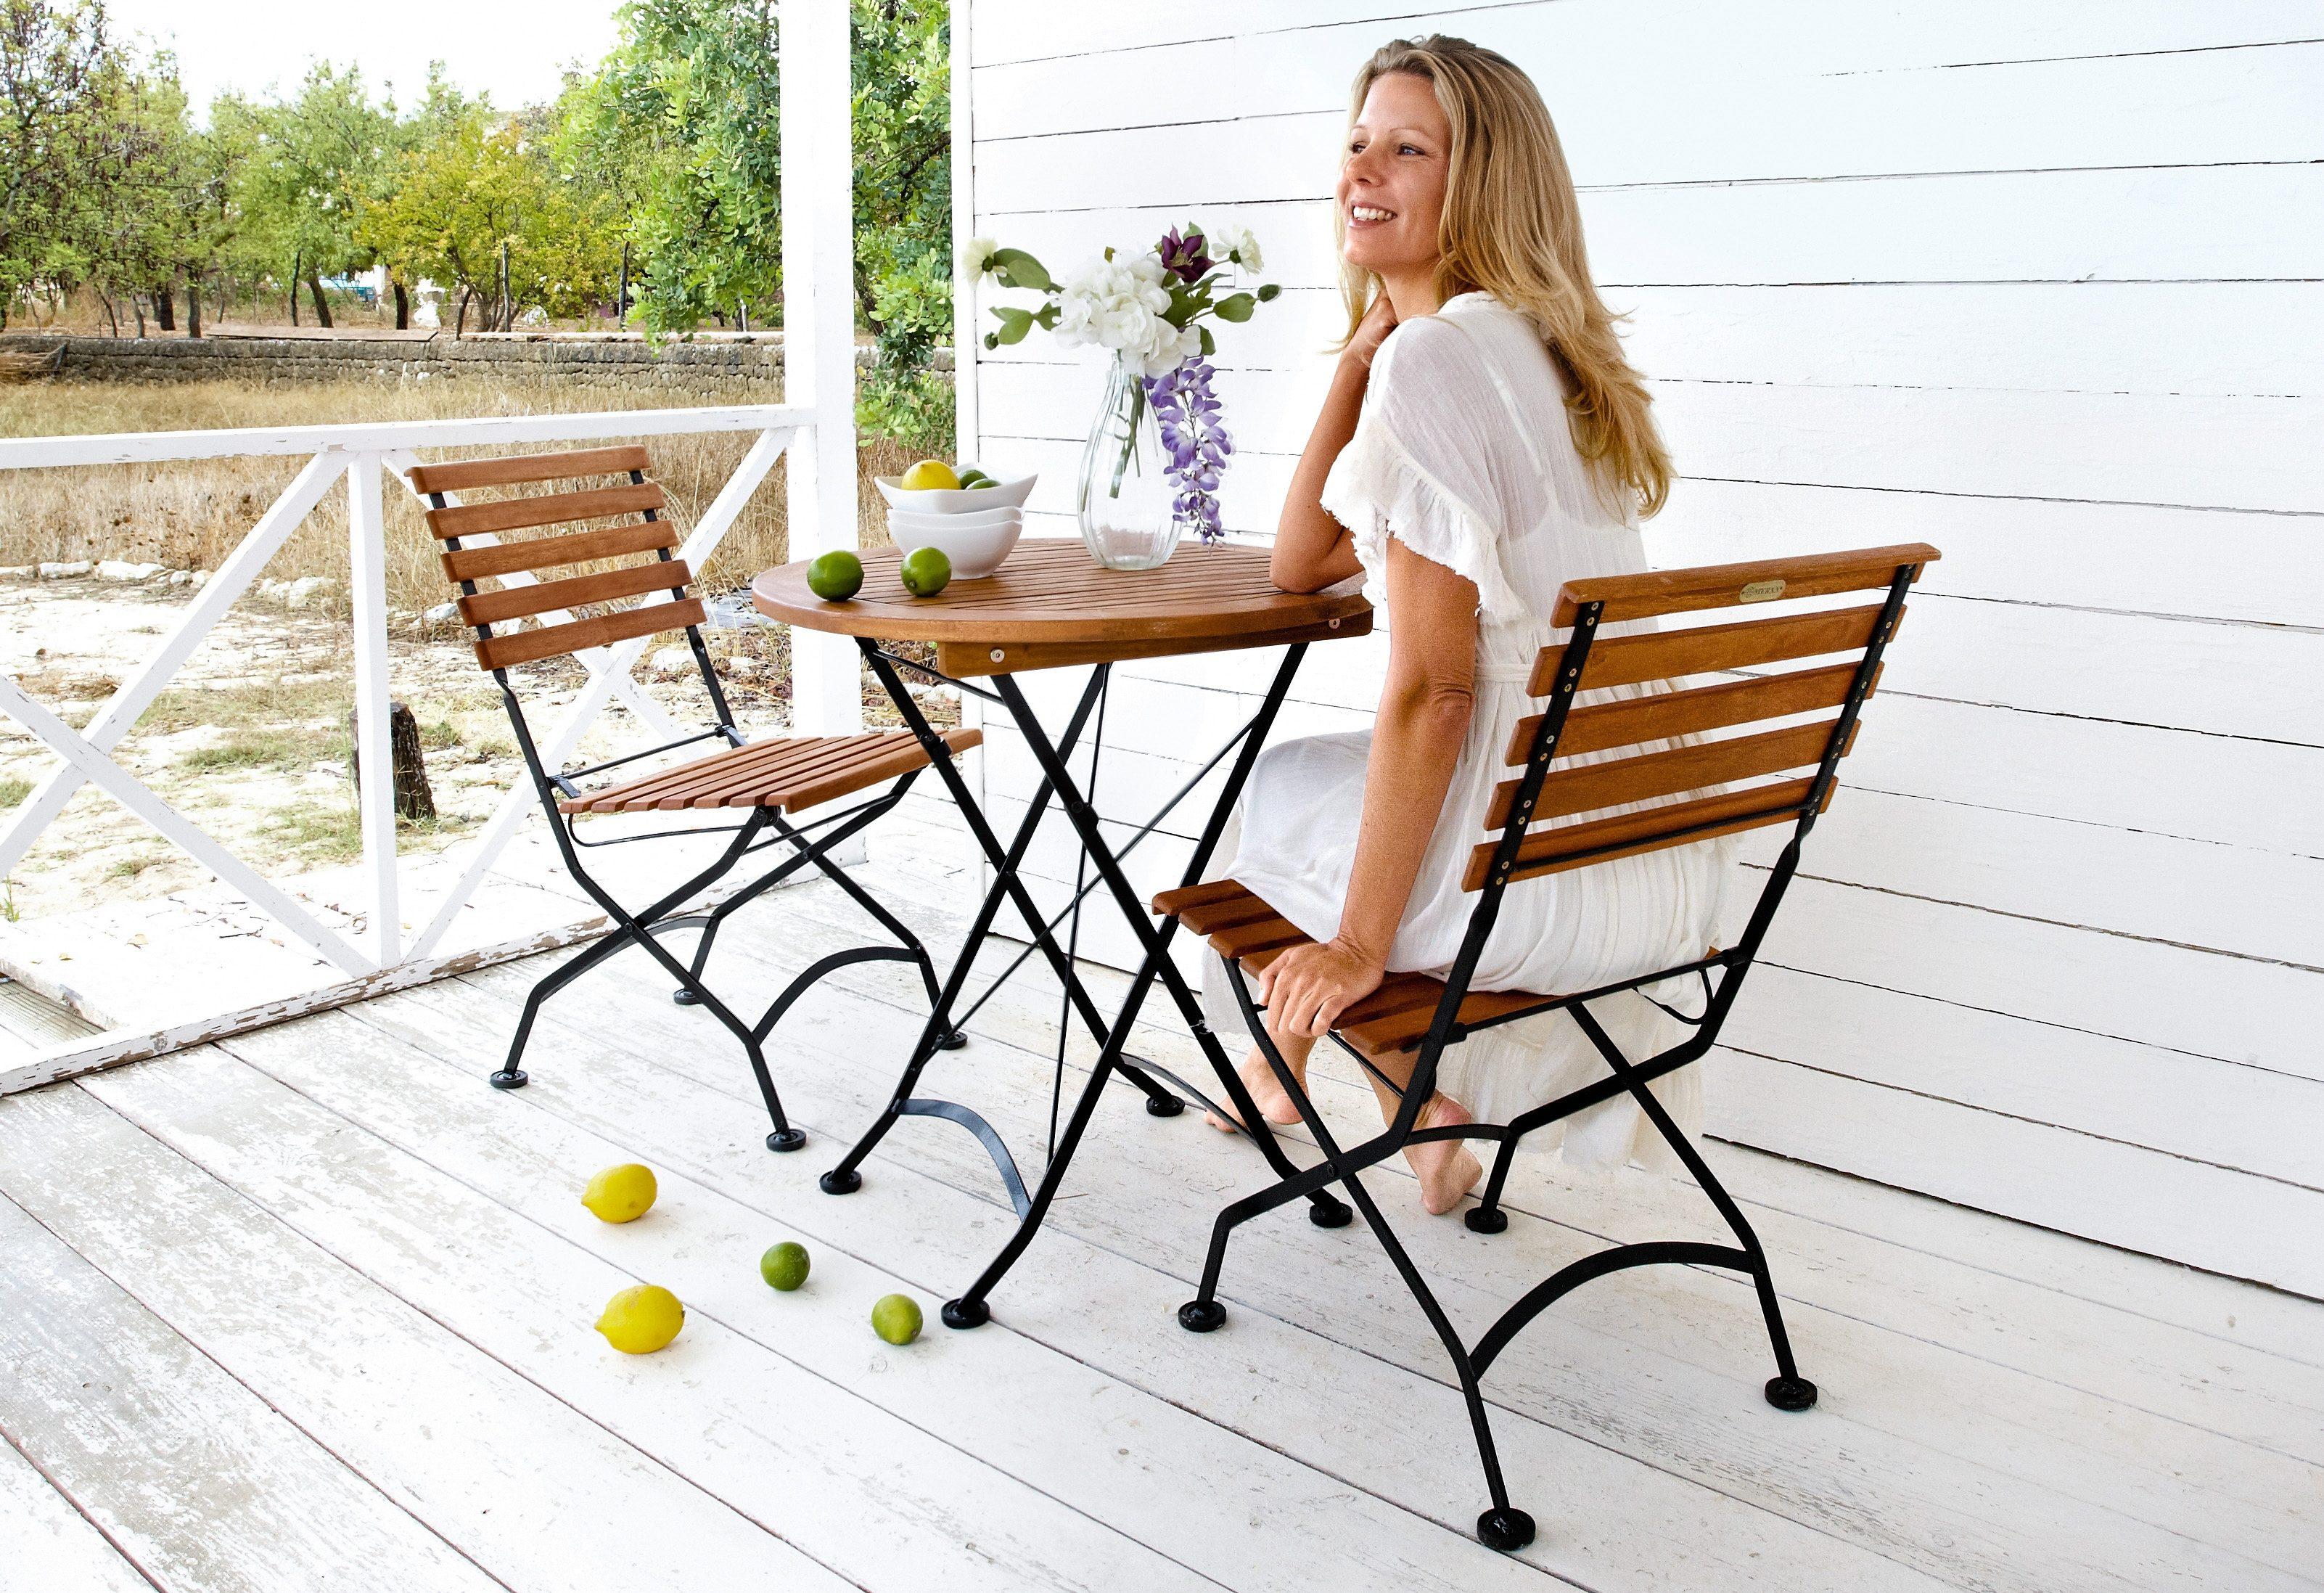 3-tlg. Gartenmöbelset »Schlossgarten«, 2 Stühle, Tisch Ø 70 cm,Stahl/Eukalyptusholz, klappbar